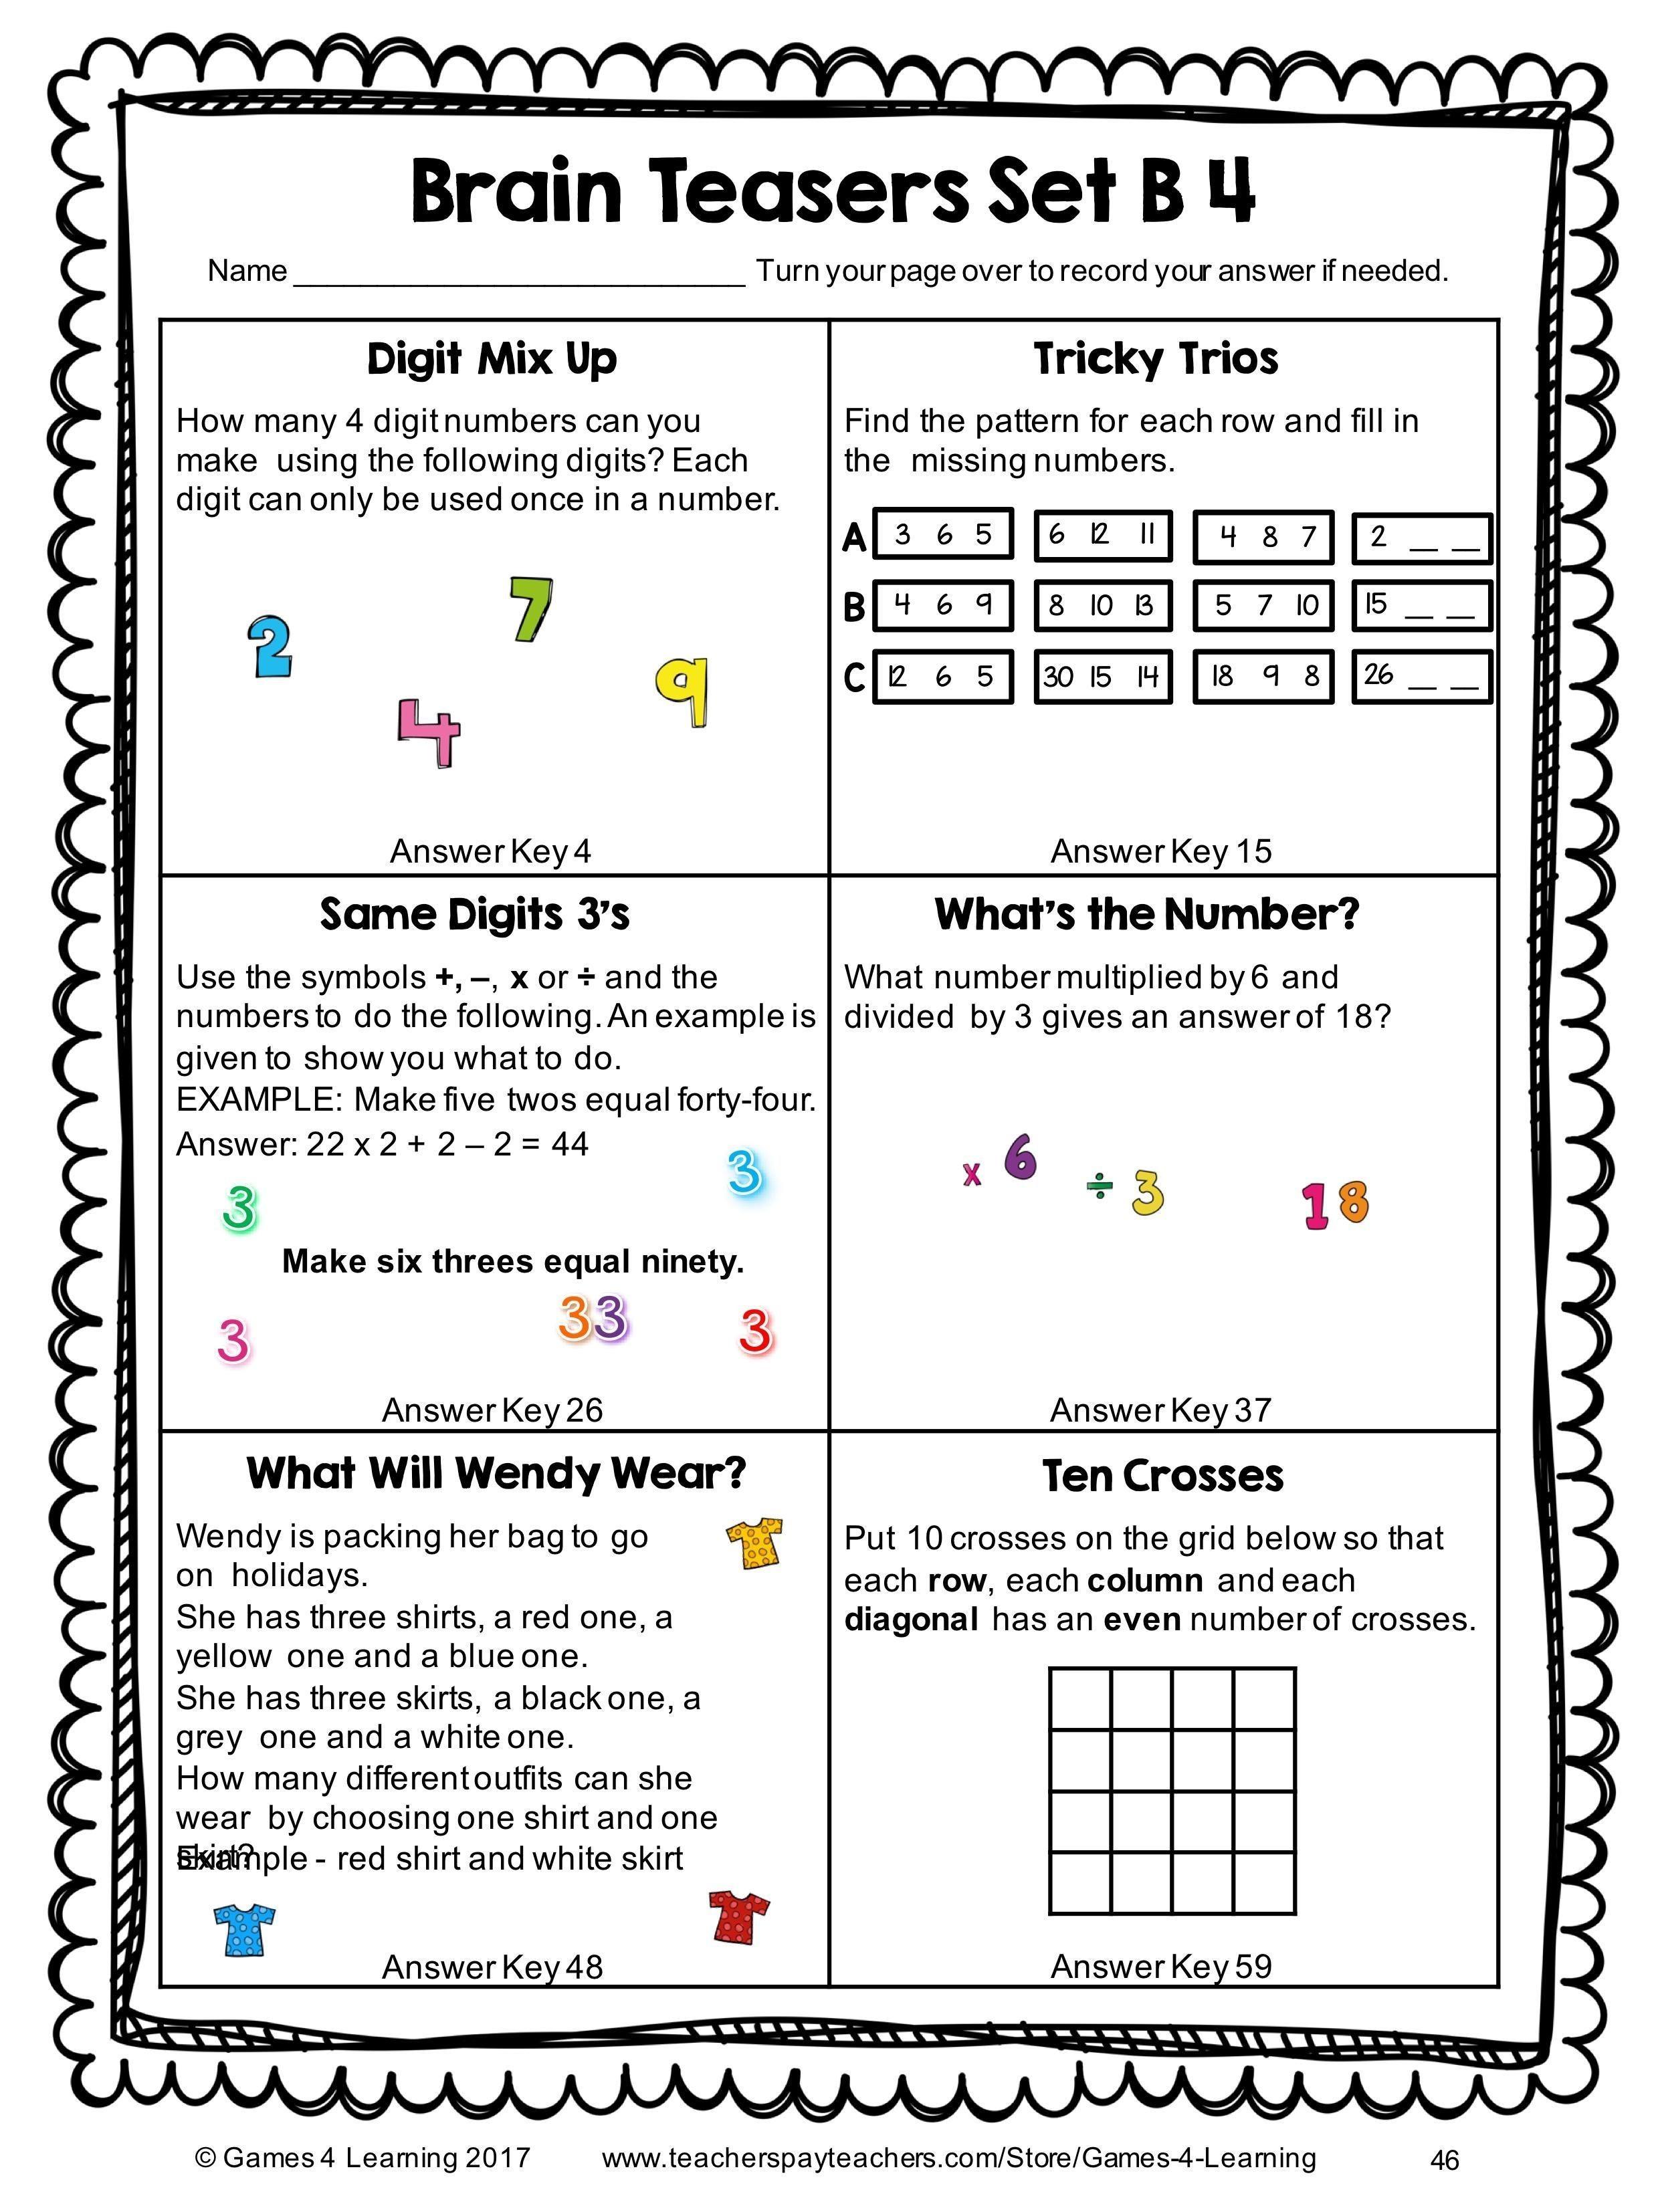 Math Worksheet: Math Riddles Worksheets Free Printable Algebra | Printable Math Riddles Worksheets